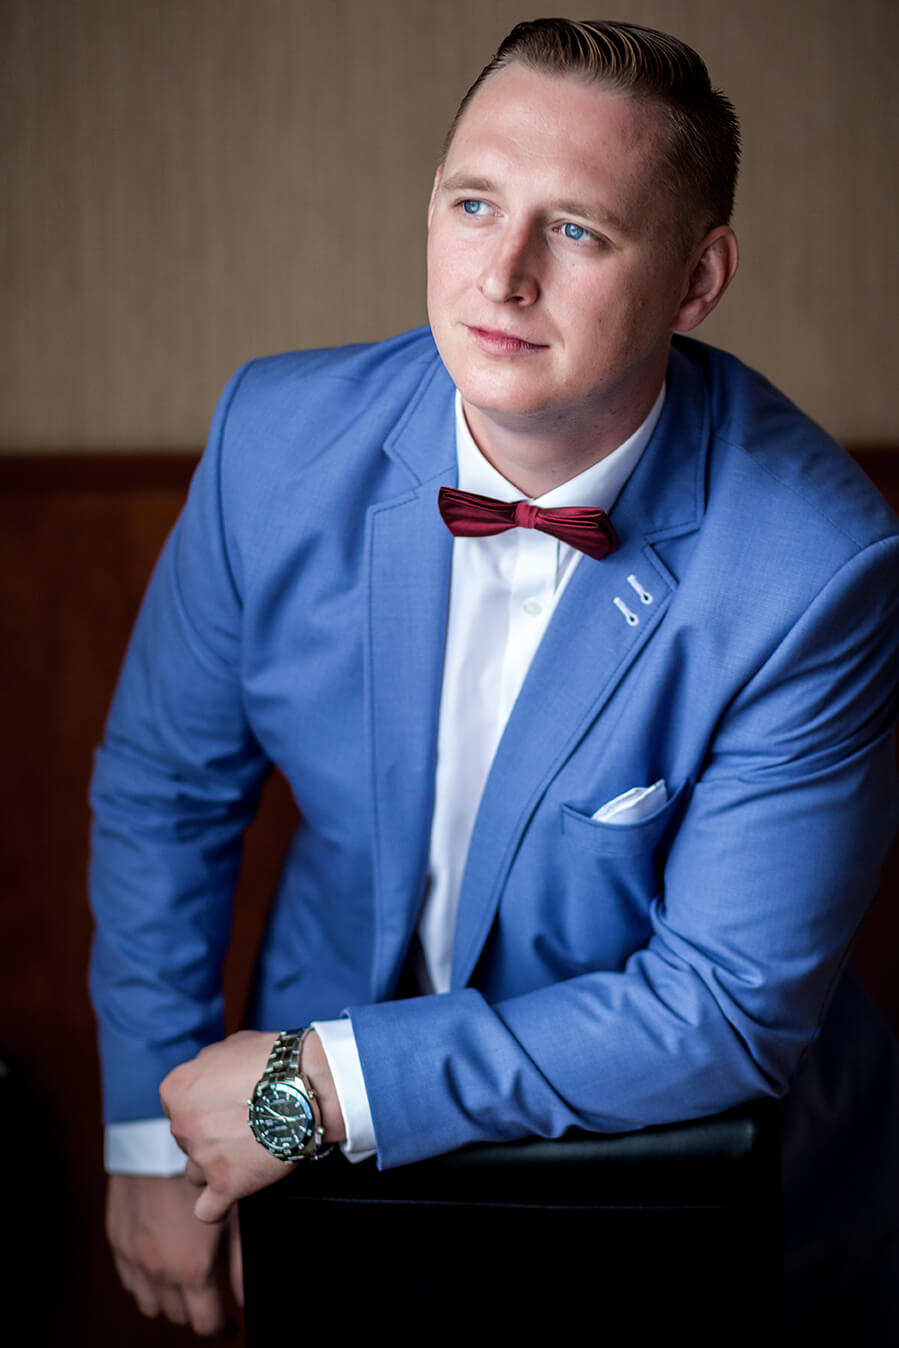 1-svadebnyj-fotograf-videooperator-svadebnoe-foto-utro-zheniha-idei-kiev-2